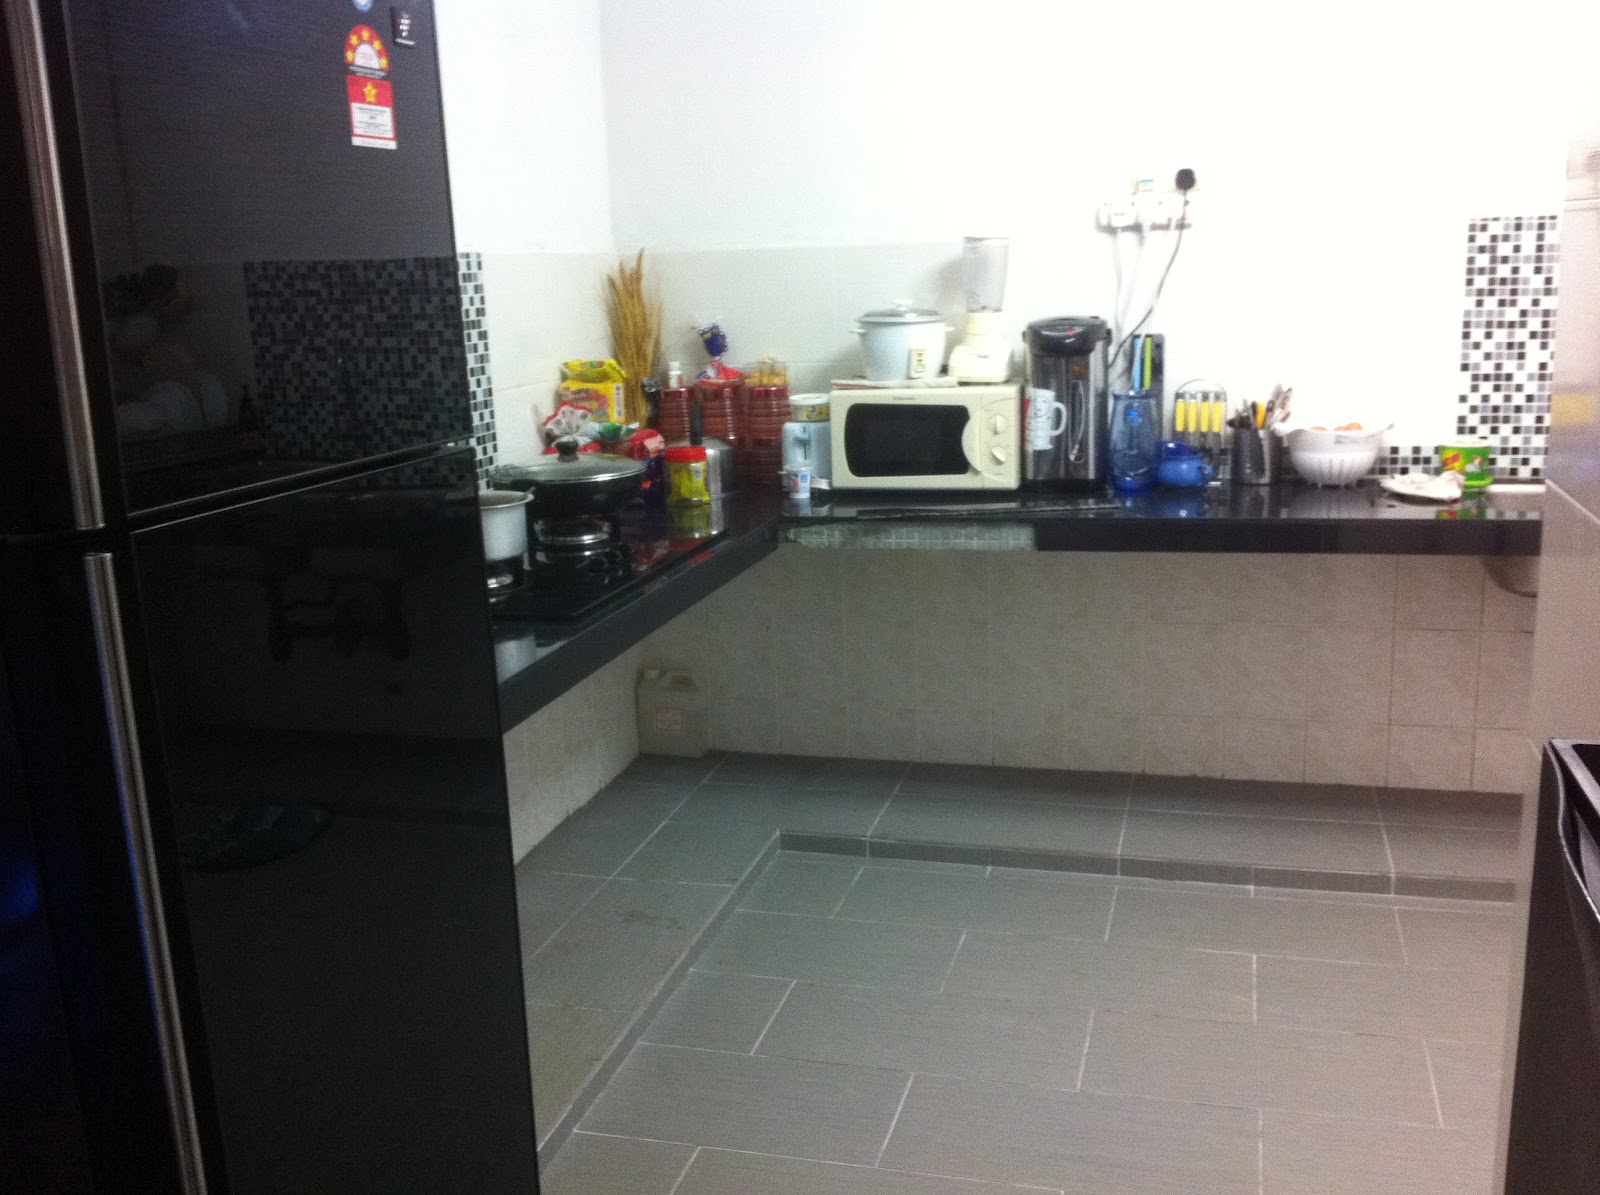 Kitchen Kabinet Dan Kos Pengubahsuaian Dapur